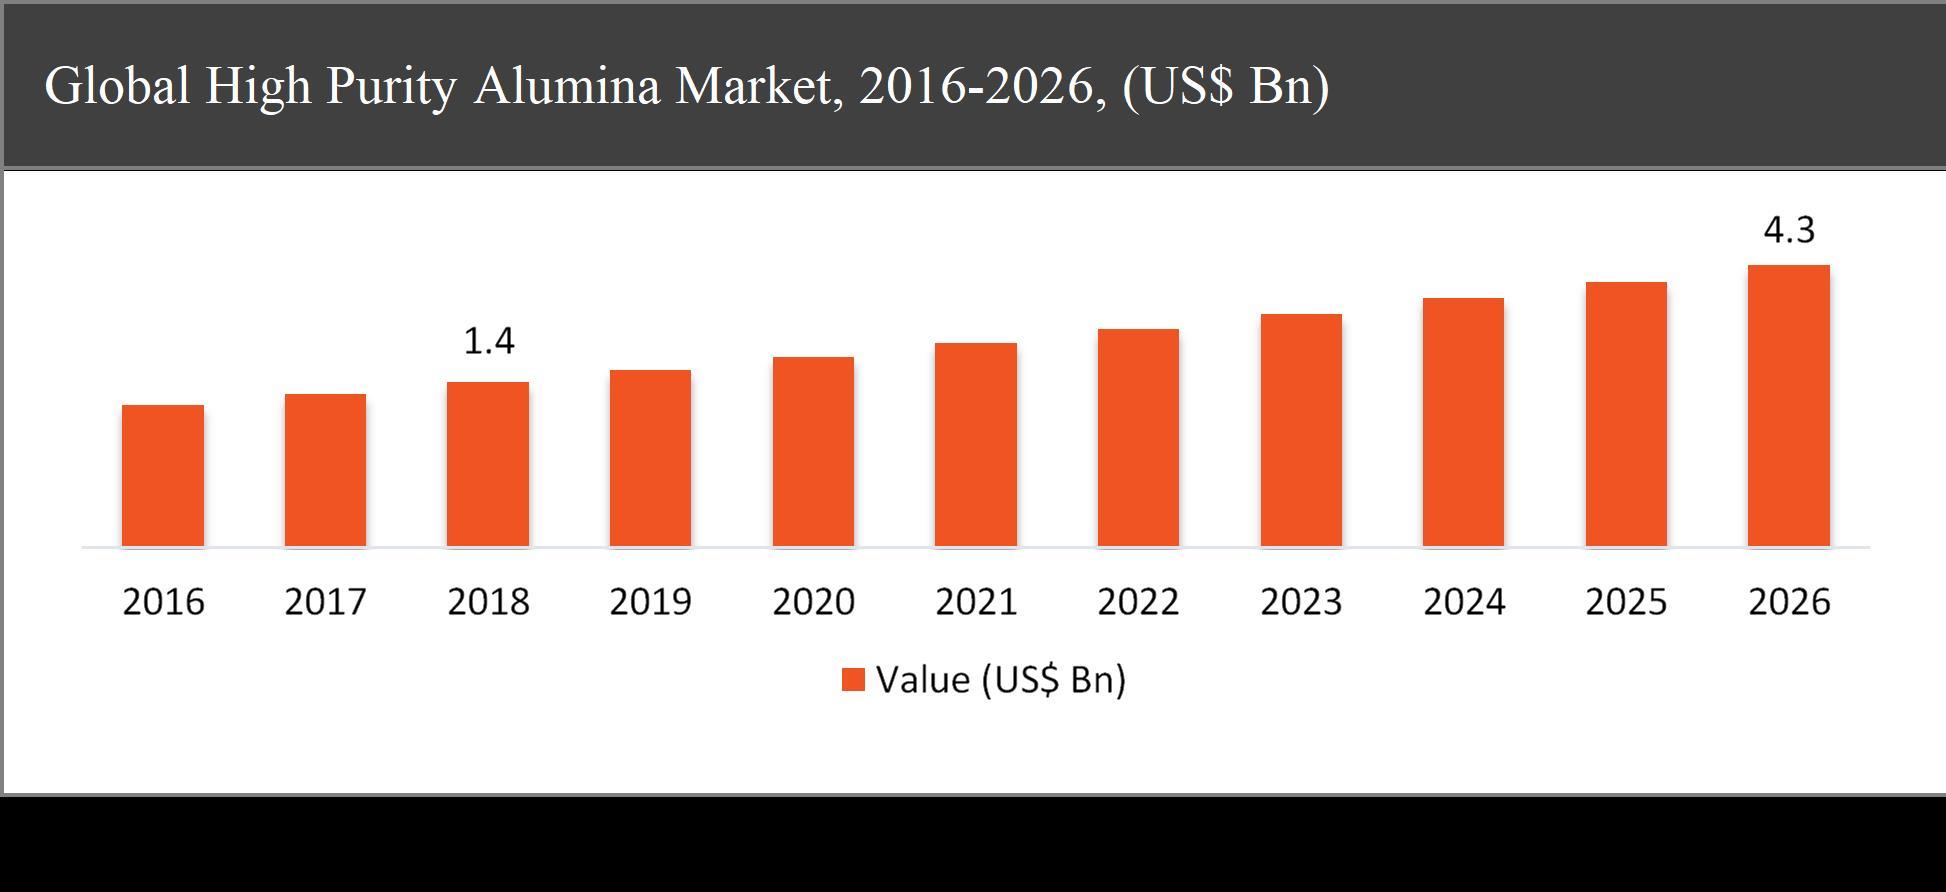 Global High Purity Alumina Market, 2016-2026, (US$ Bn)